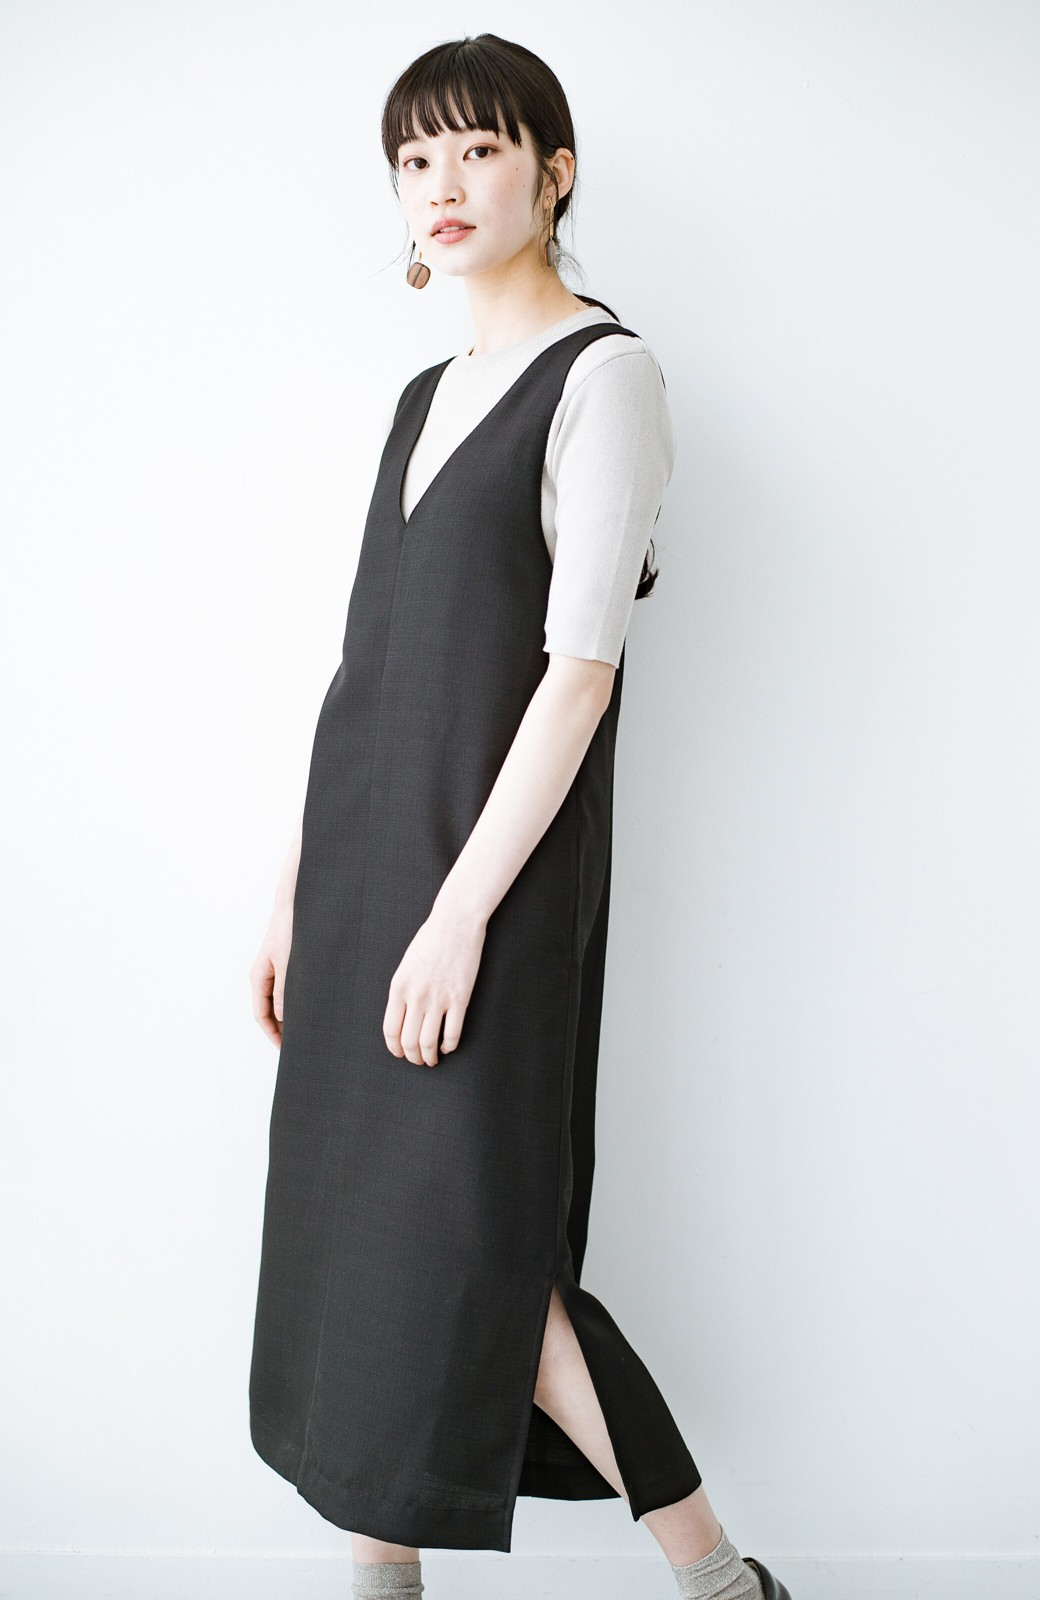 haco! 何てことないTシャツと重ねるだけでパッとかわいくなれる 魔法のようなジャンパースカート <ブラック>の商品写真16